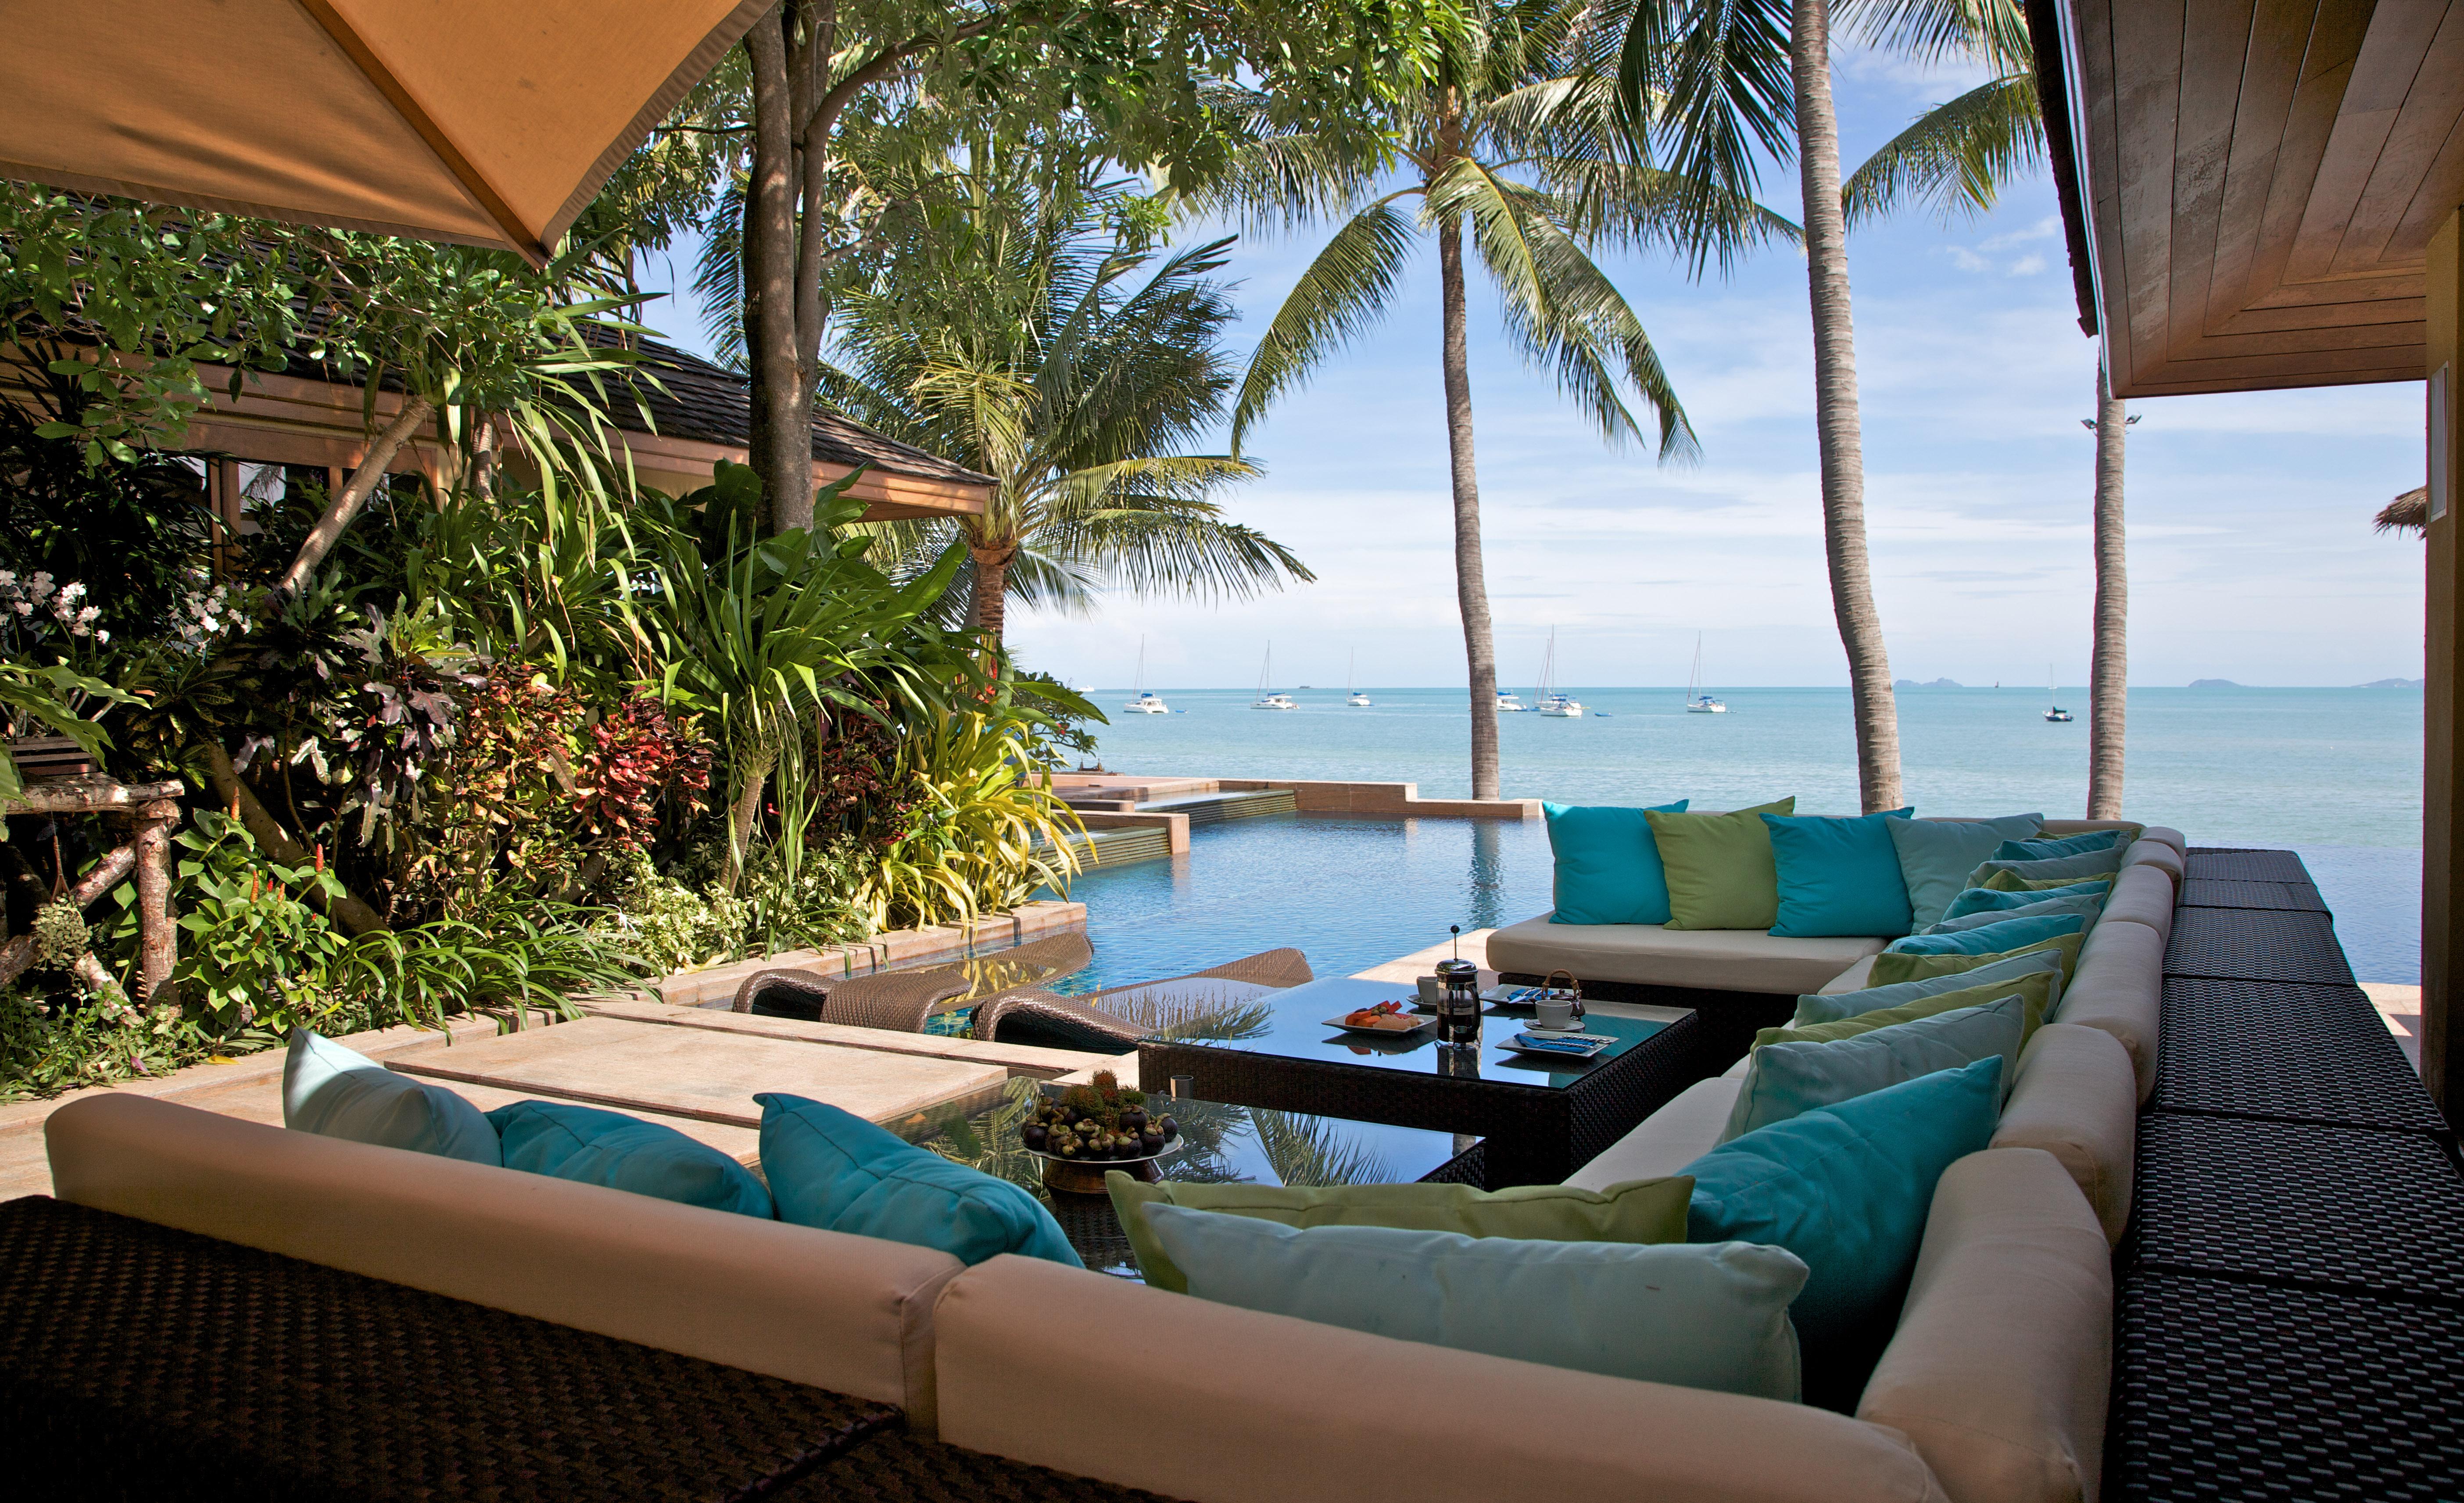 Outdoor Terrace poolside Lounge